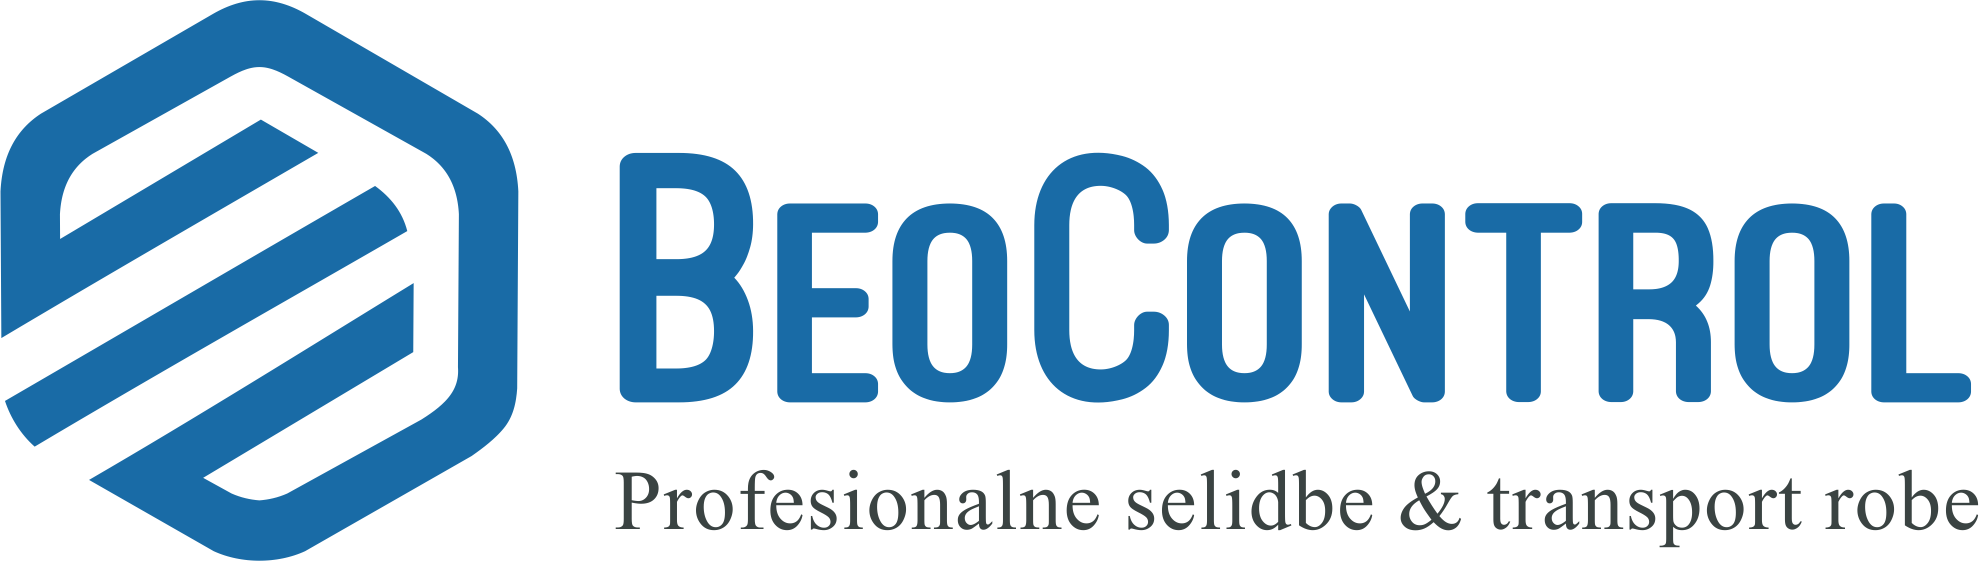 Agencija za selidbe BeoControl